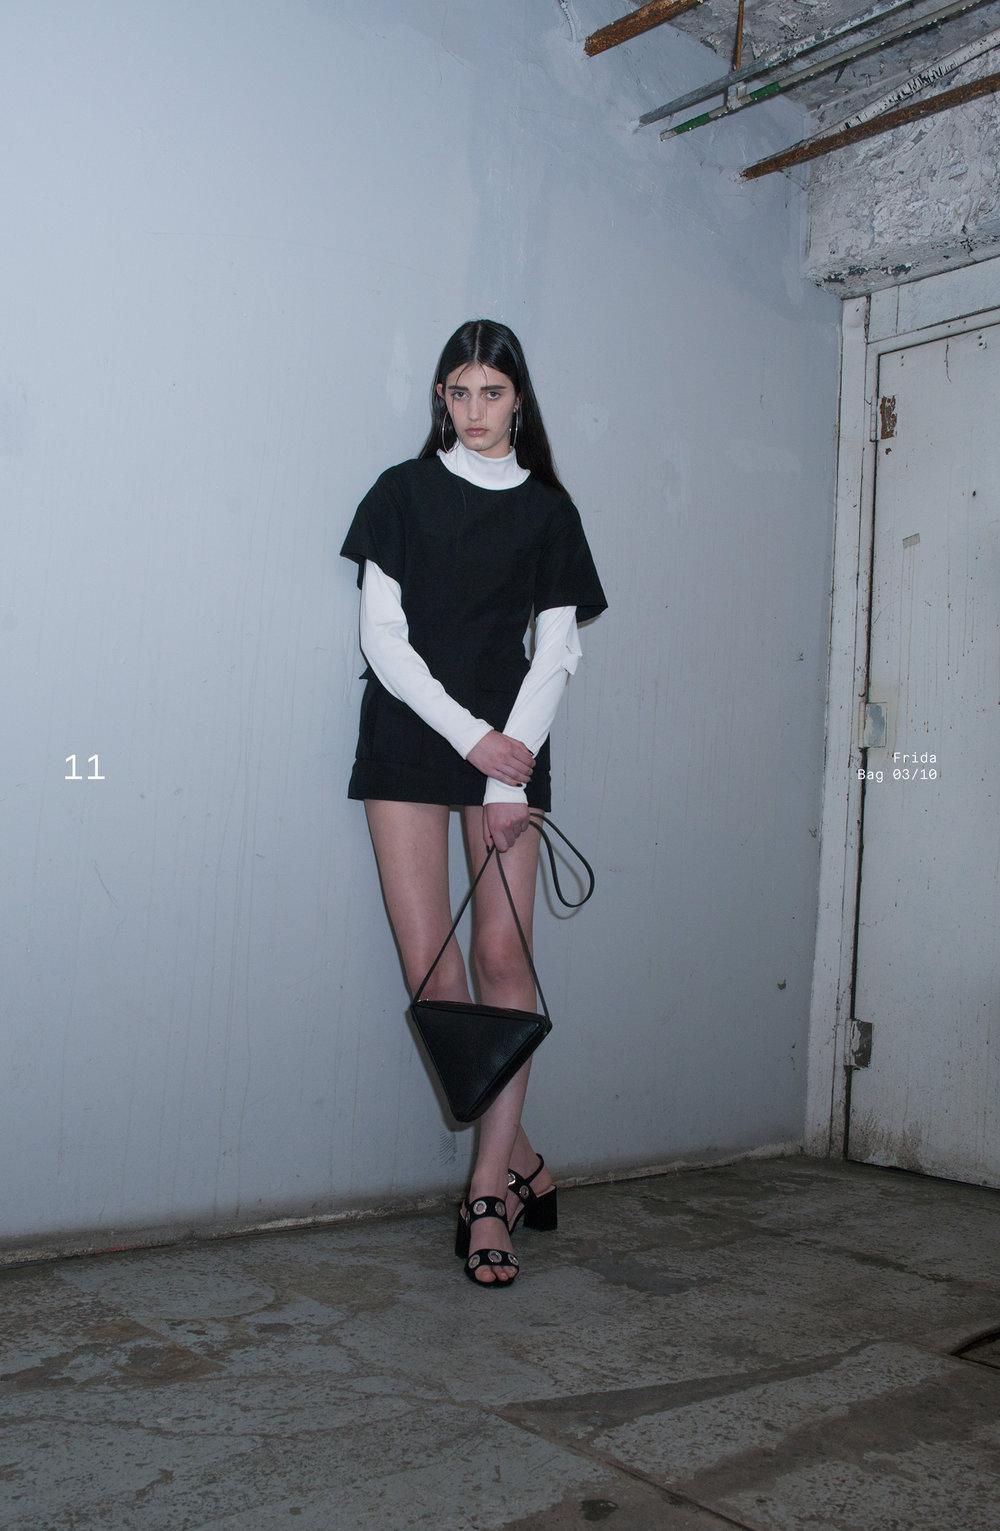 Sonya Lee - Frida Bag 03/10